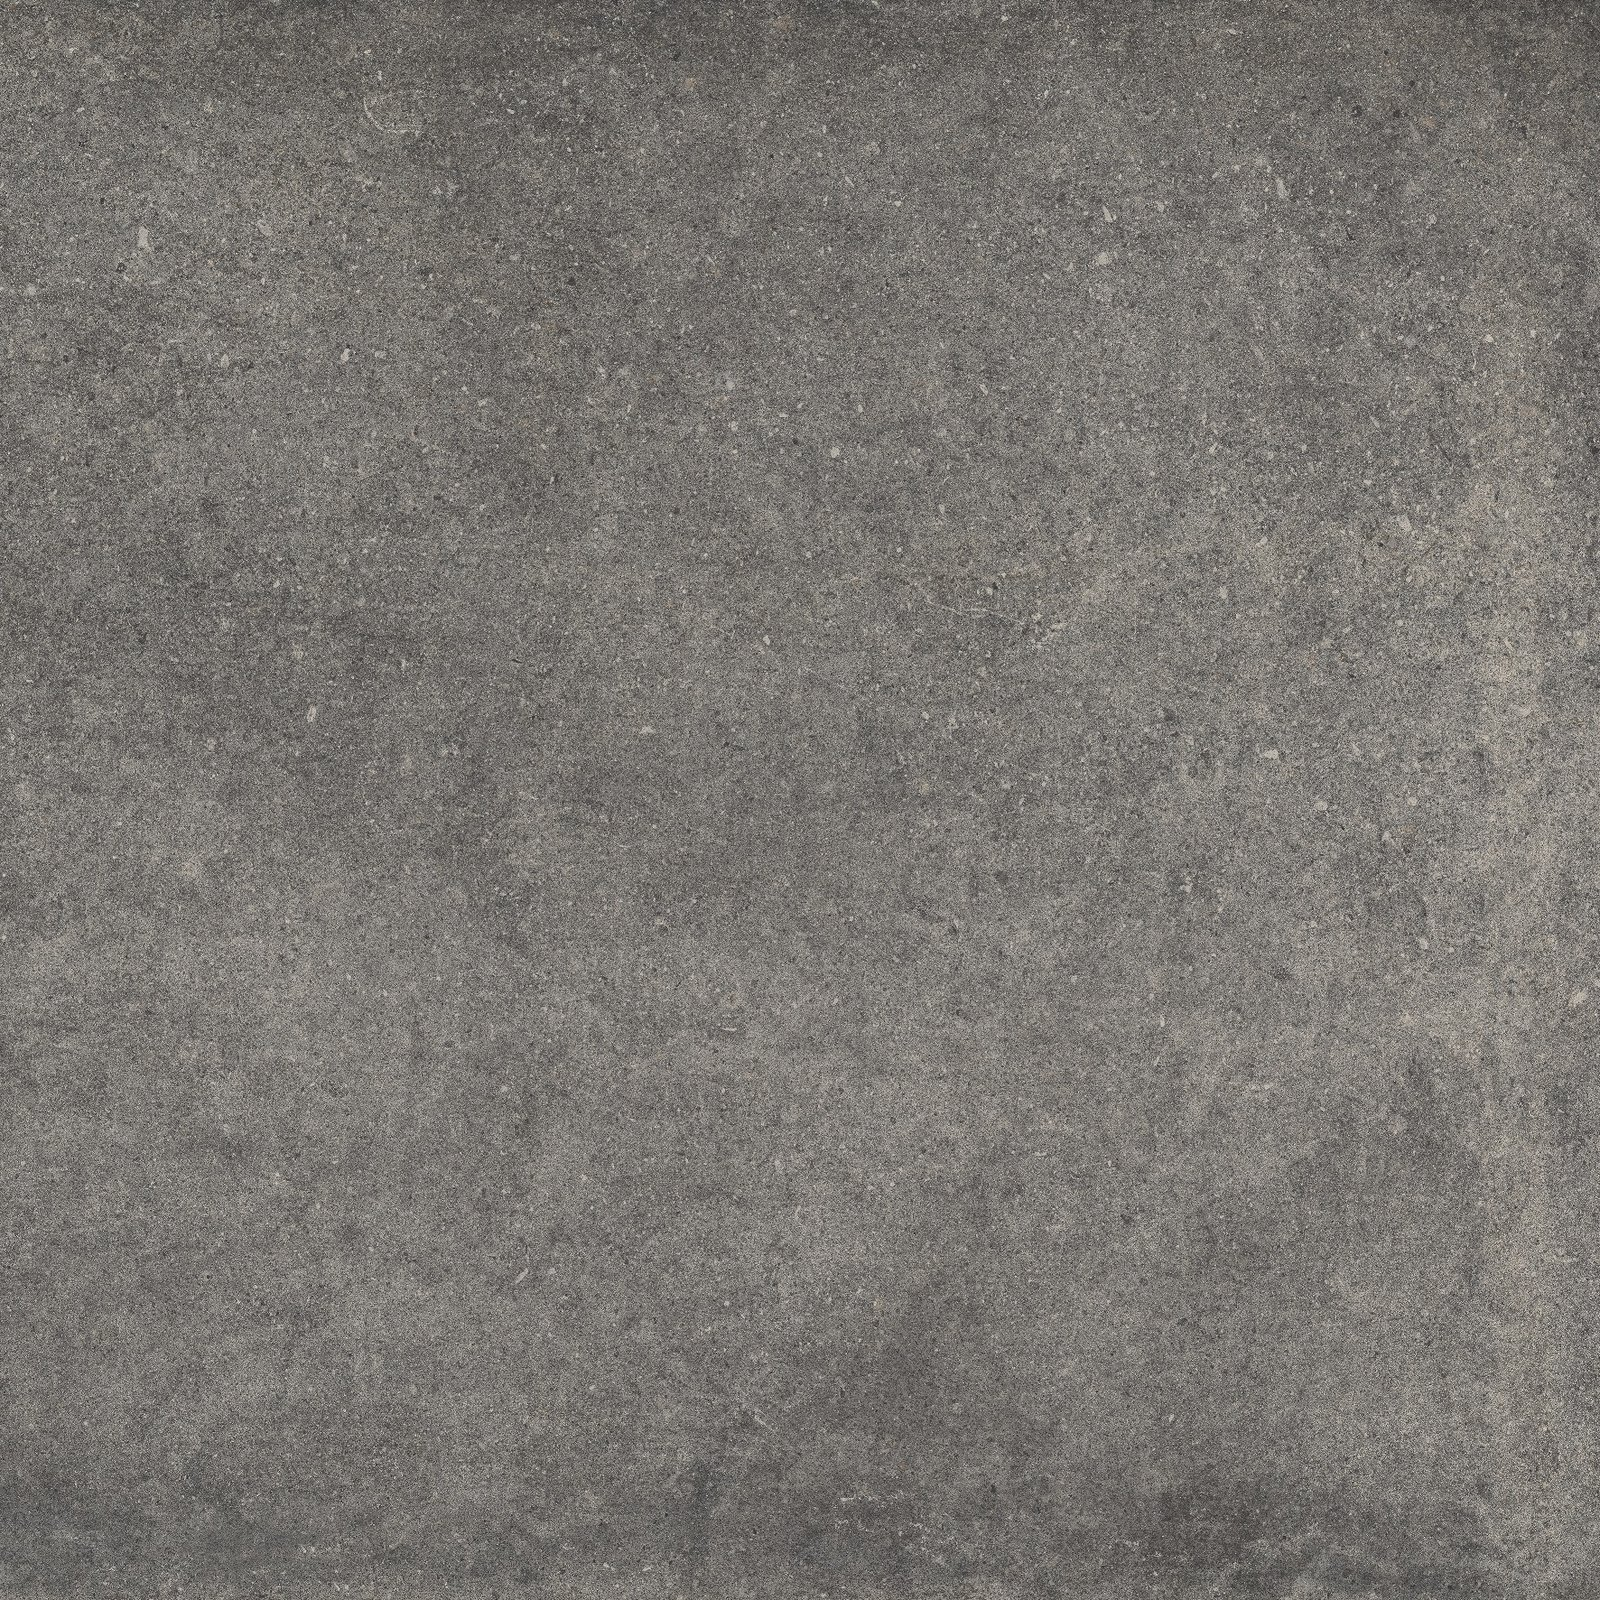 Плитка BLACK (X60RM9R) изображение 0